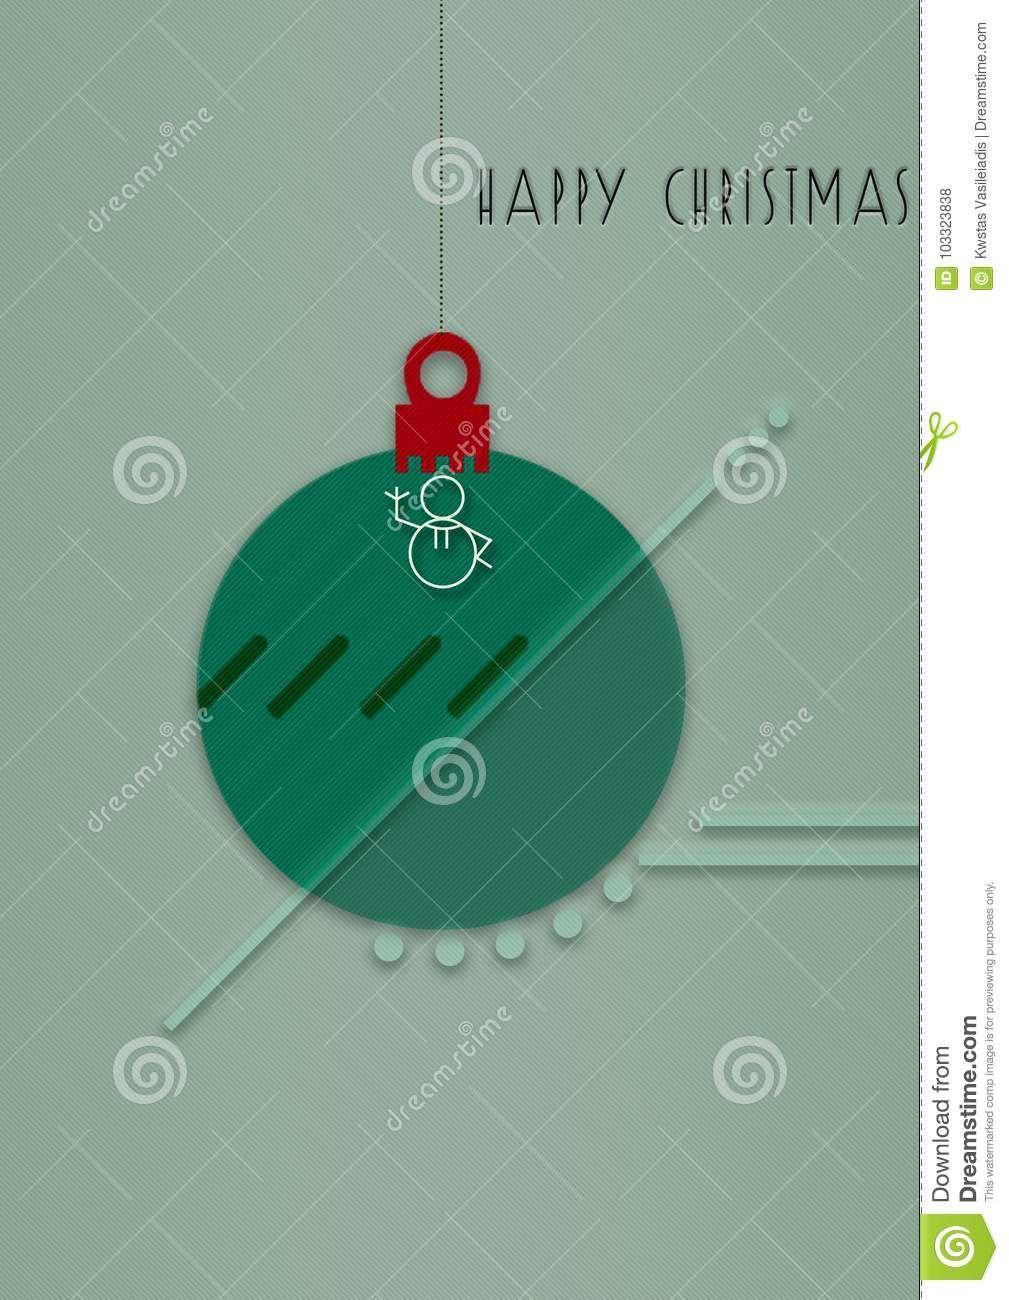 Pin by kostas vasileiadis on χριστουγεννα pinterest christmas